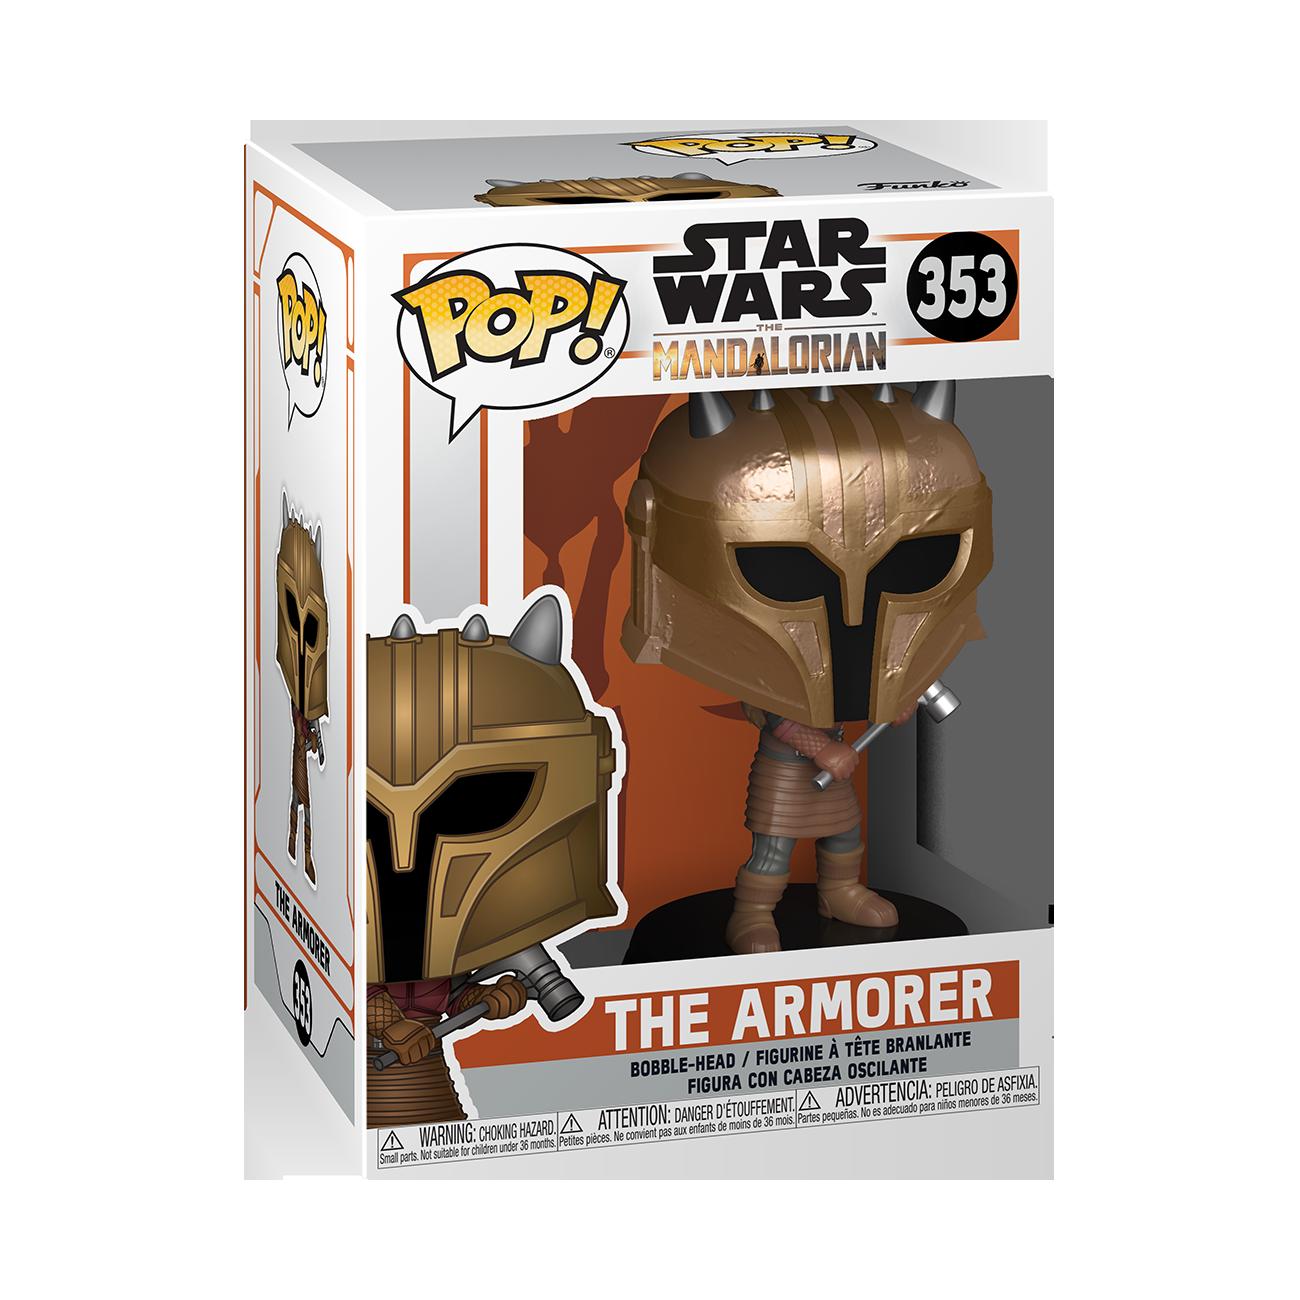 Star Wars: The Mandalorian - The Armor (Metallic) Pop! Vinyl Figure image